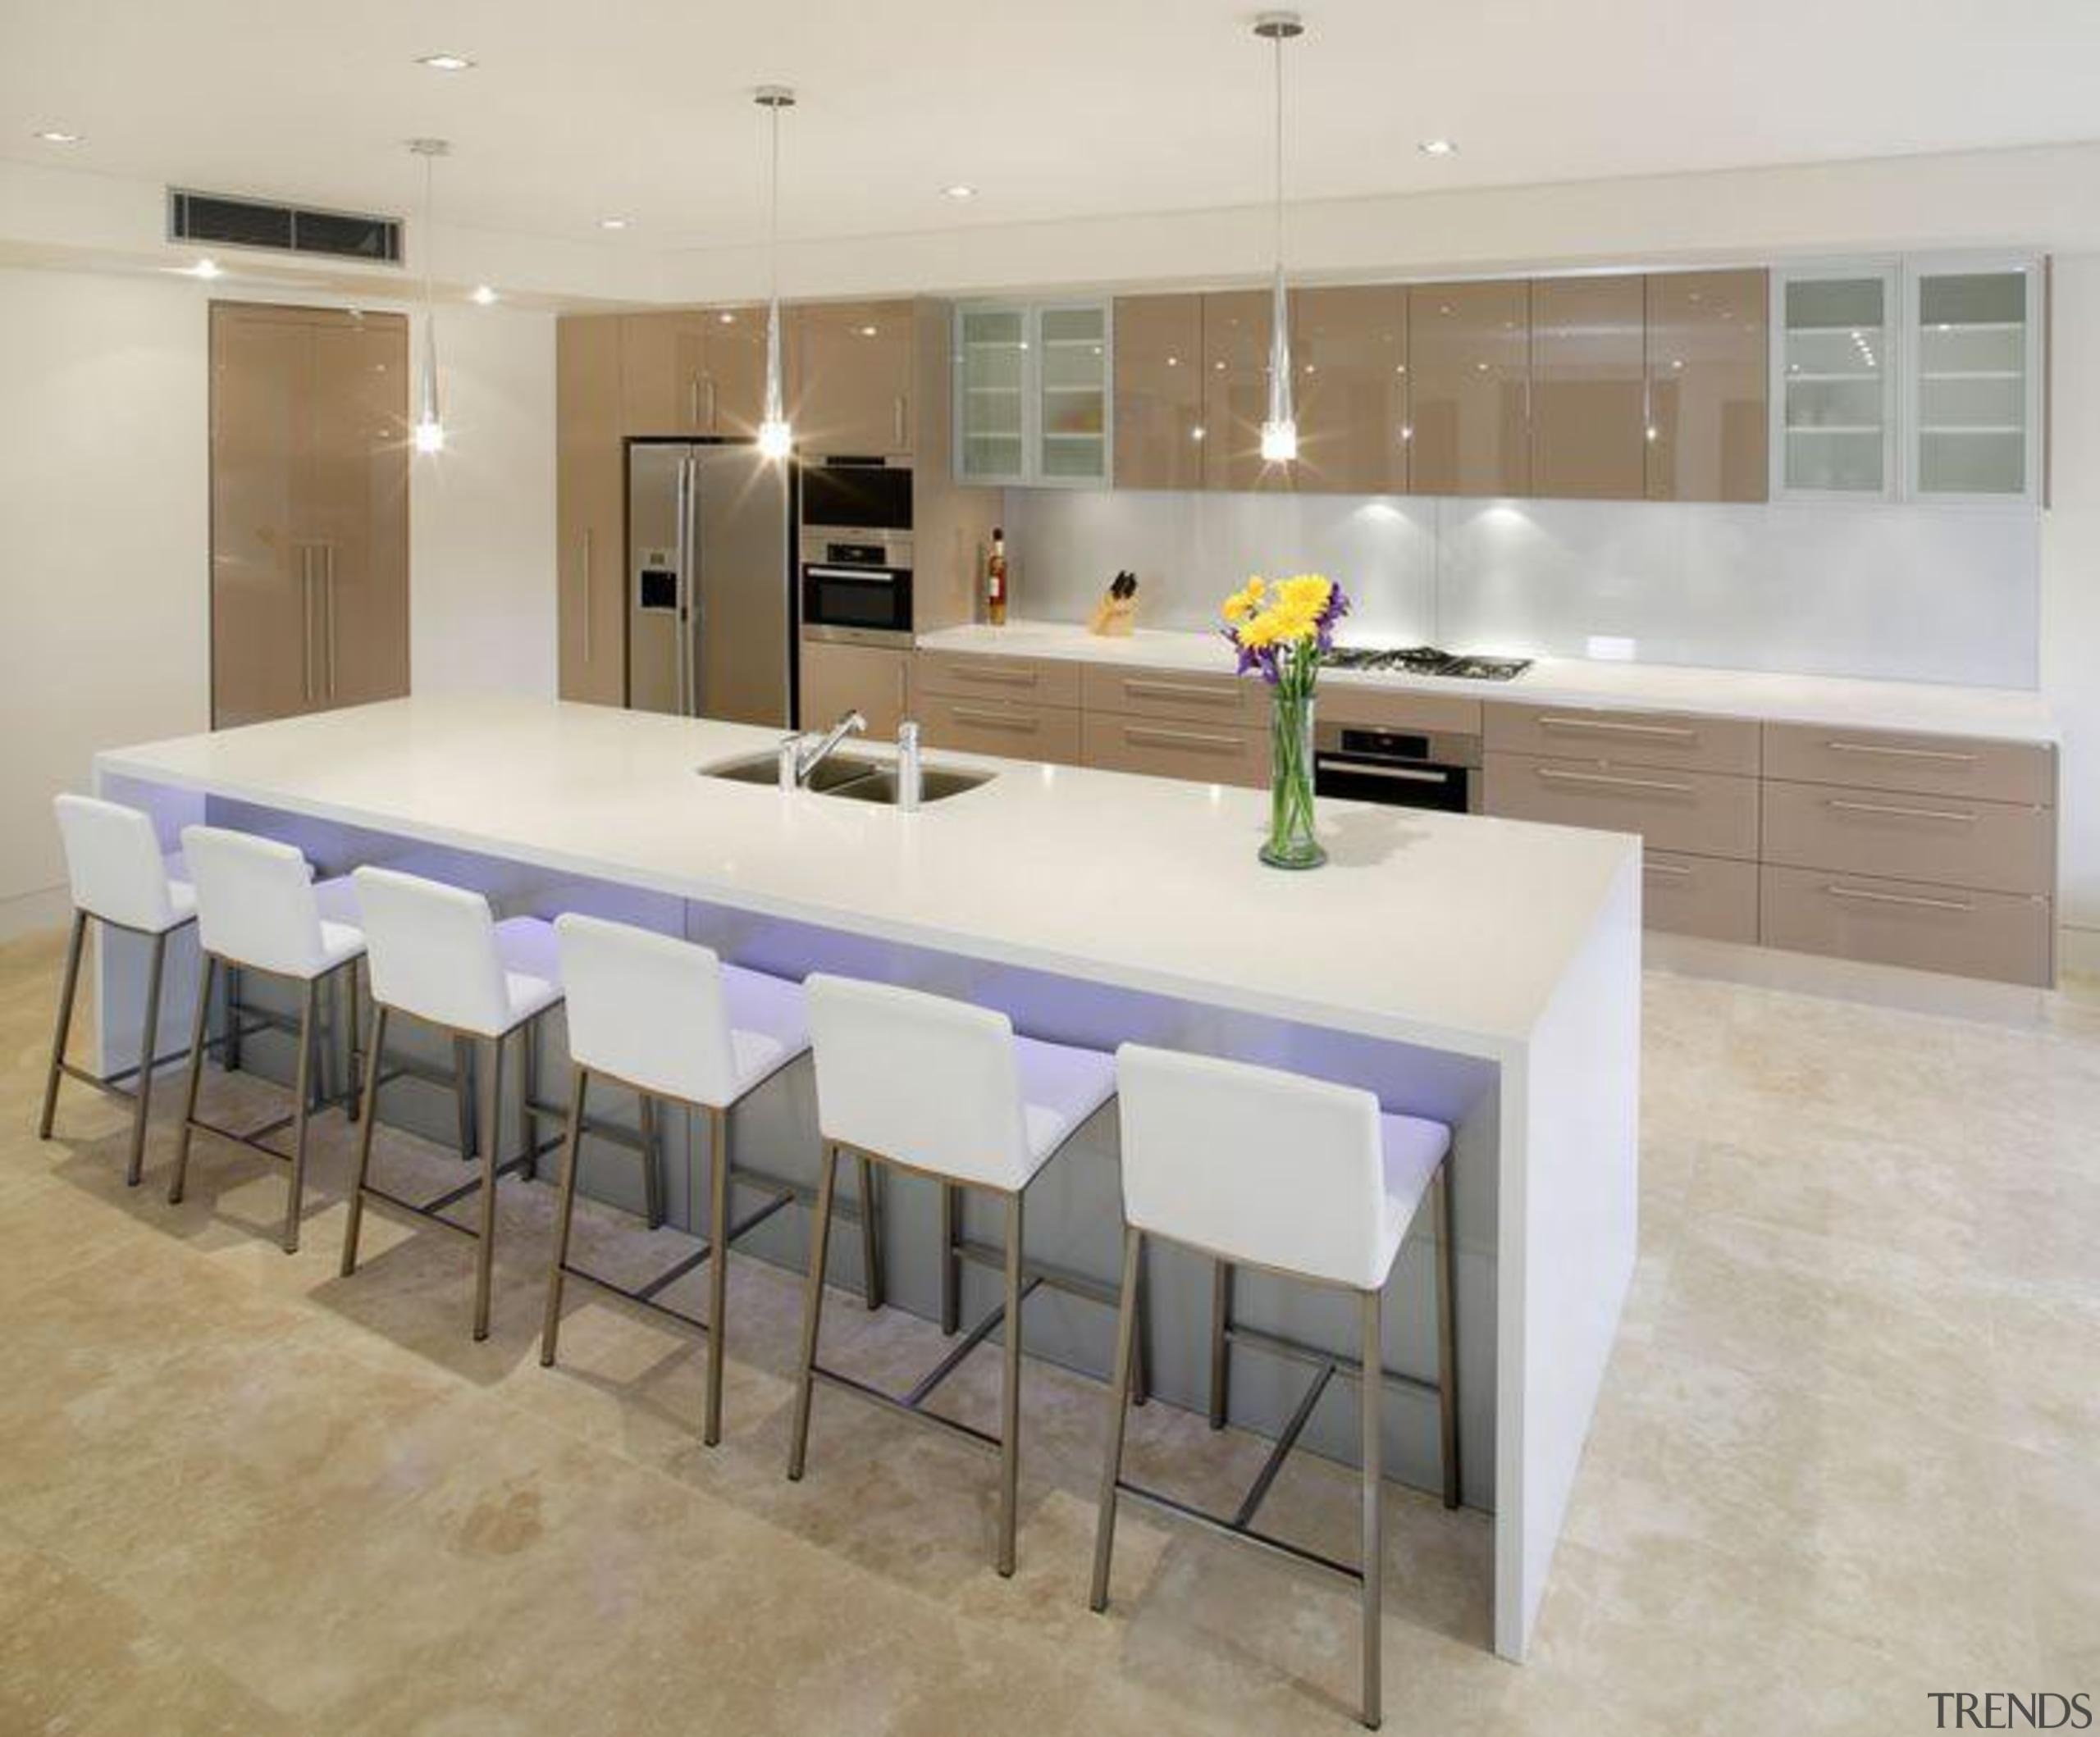 Attard's Kitchens & Cabinetry Osprey - Osprey™ - countertop, floor, flooring, interior design, kitchen, real estate, room, table, tile, gray